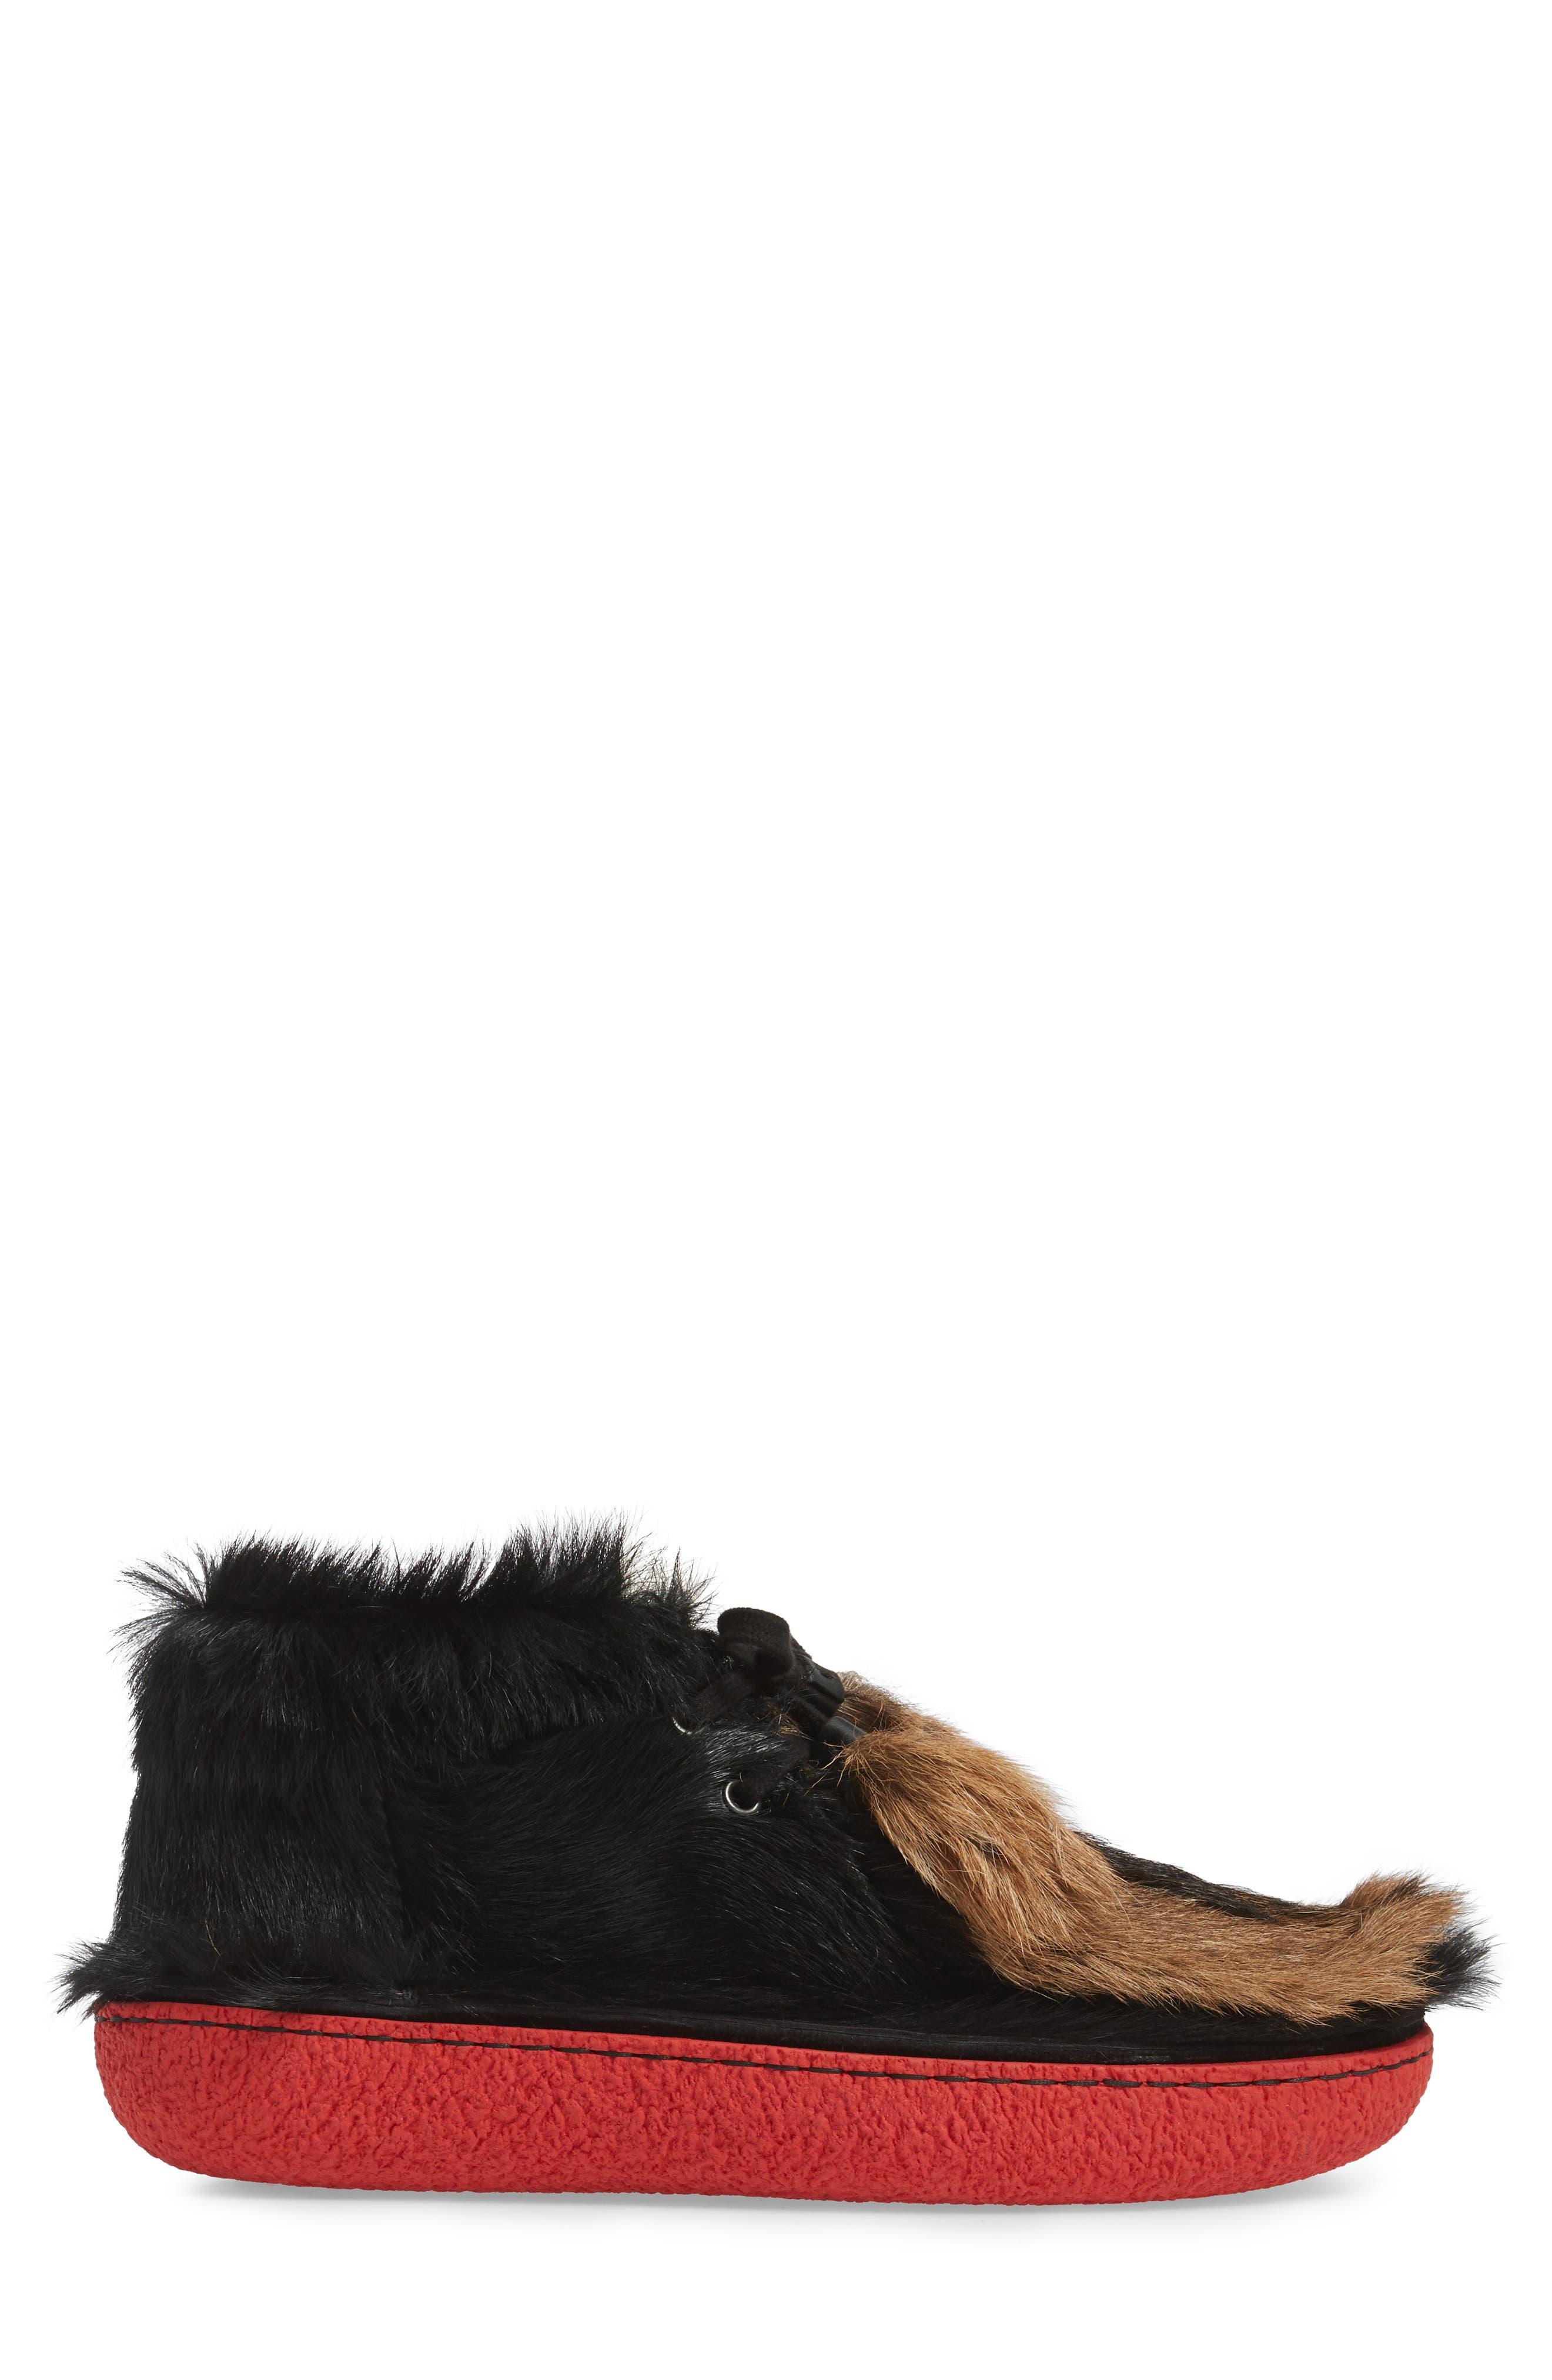 Genuine Calf and Goat Hair Chukka Boot,                             Alternate thumbnail 3, color,                             Nero Multi